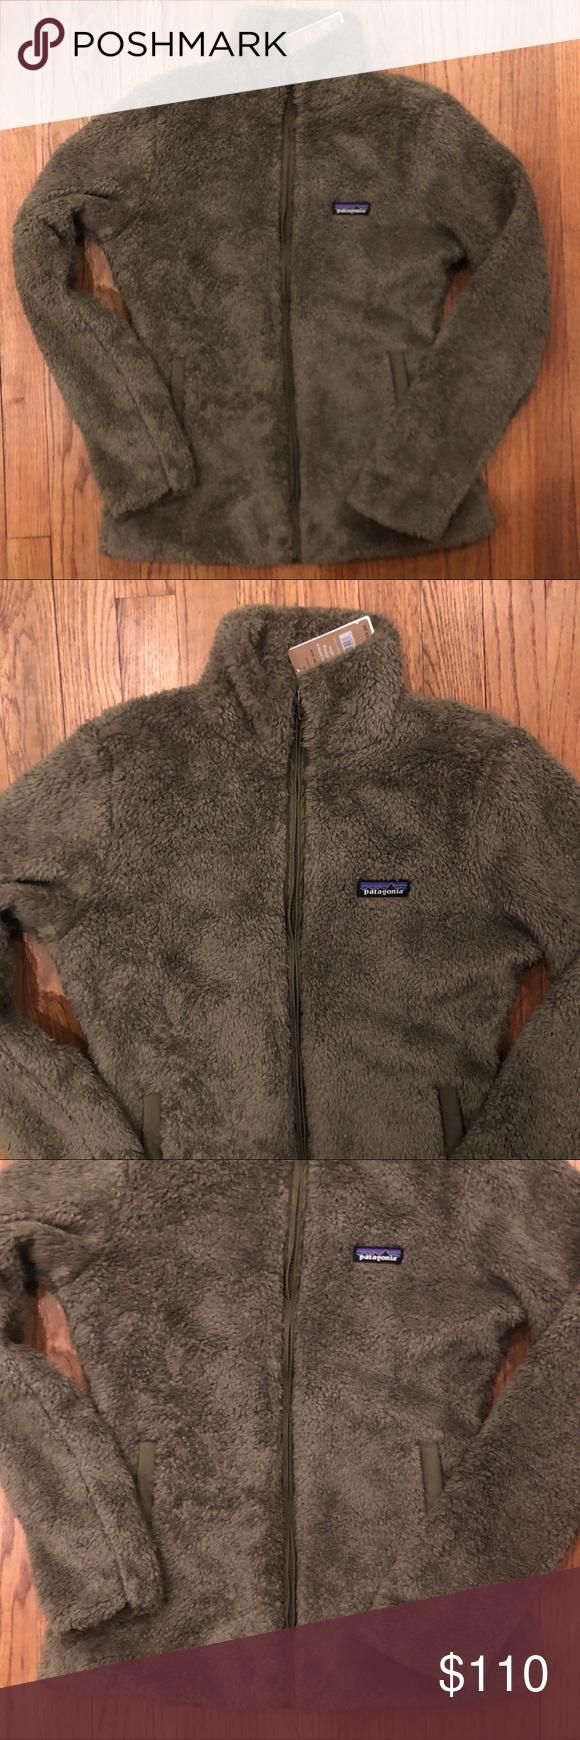 5ebc2ba26f Patagonia Women s Los Gatos Fleece Jacket Size M Patagonia Women s Los  Gatos Fleece Jacket Size M